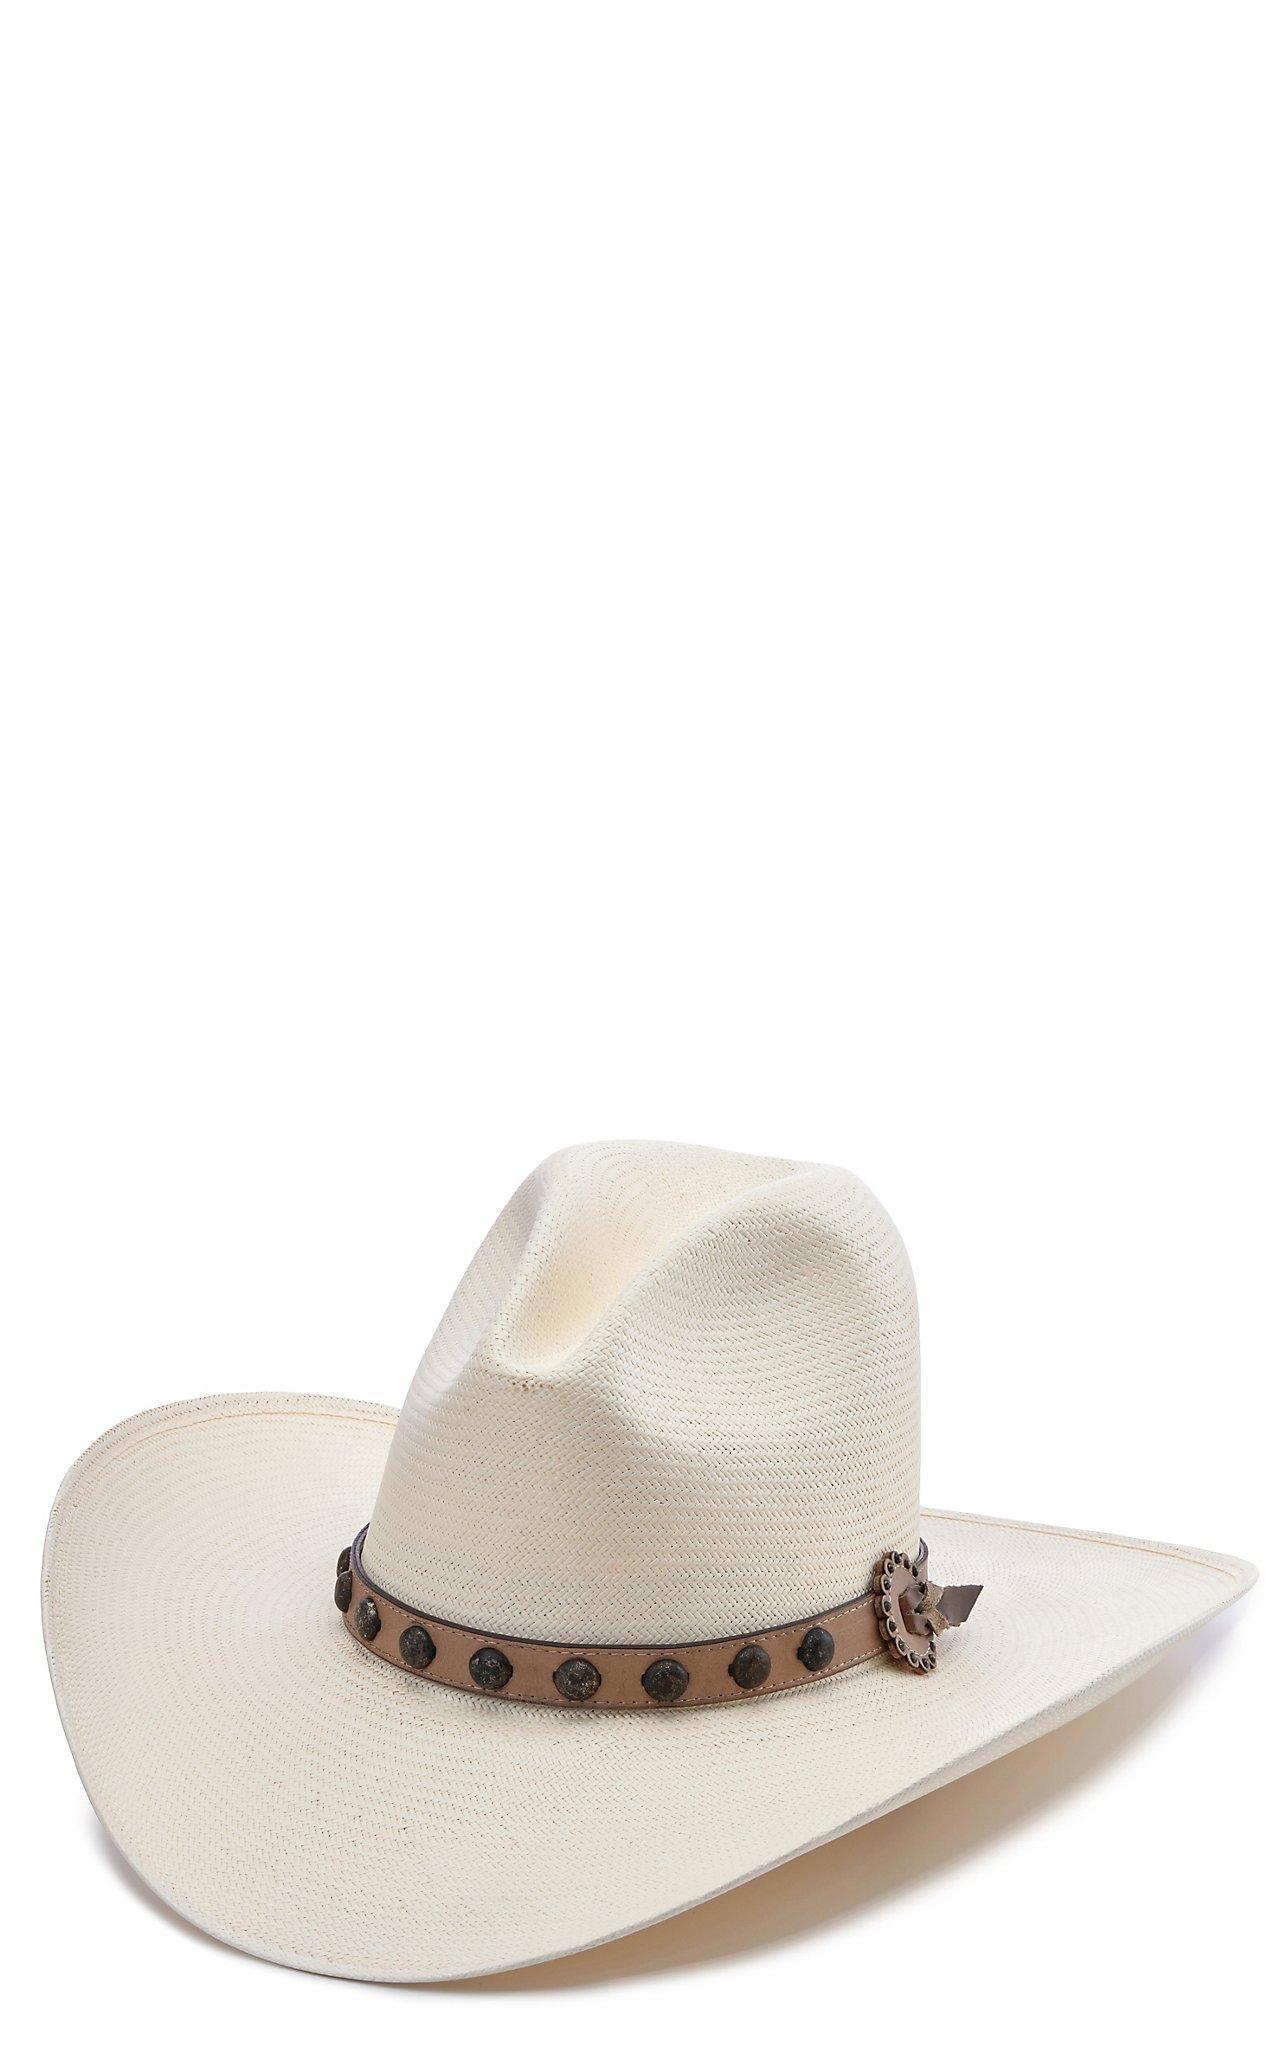 Stetson 10X Broken Bow Gus Natural Straw Cowboy Hat 731401adf0a1